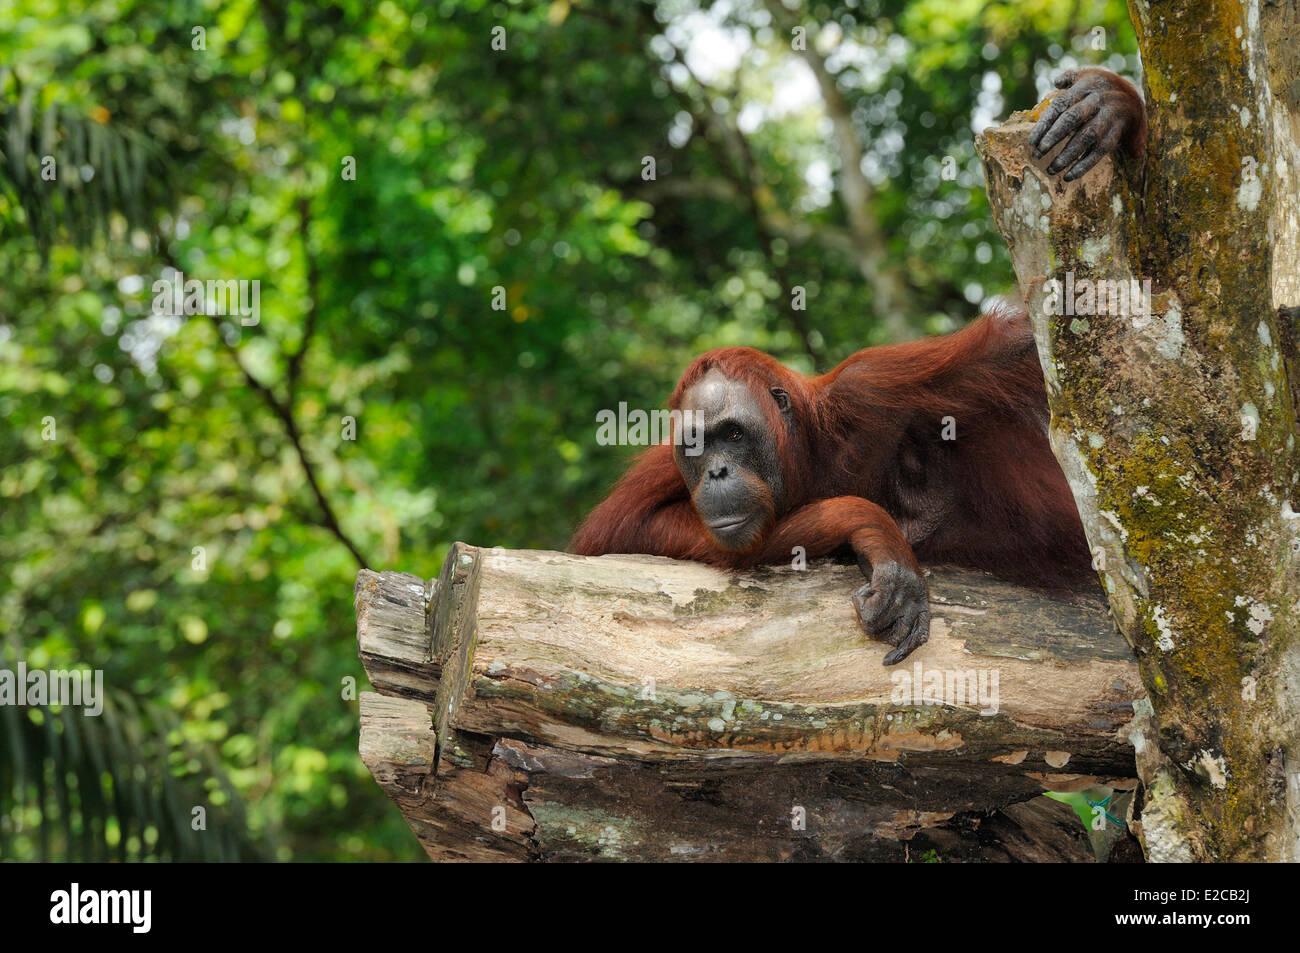 Singapore, Singapore Zoo, bornean orang utan - Stock Image